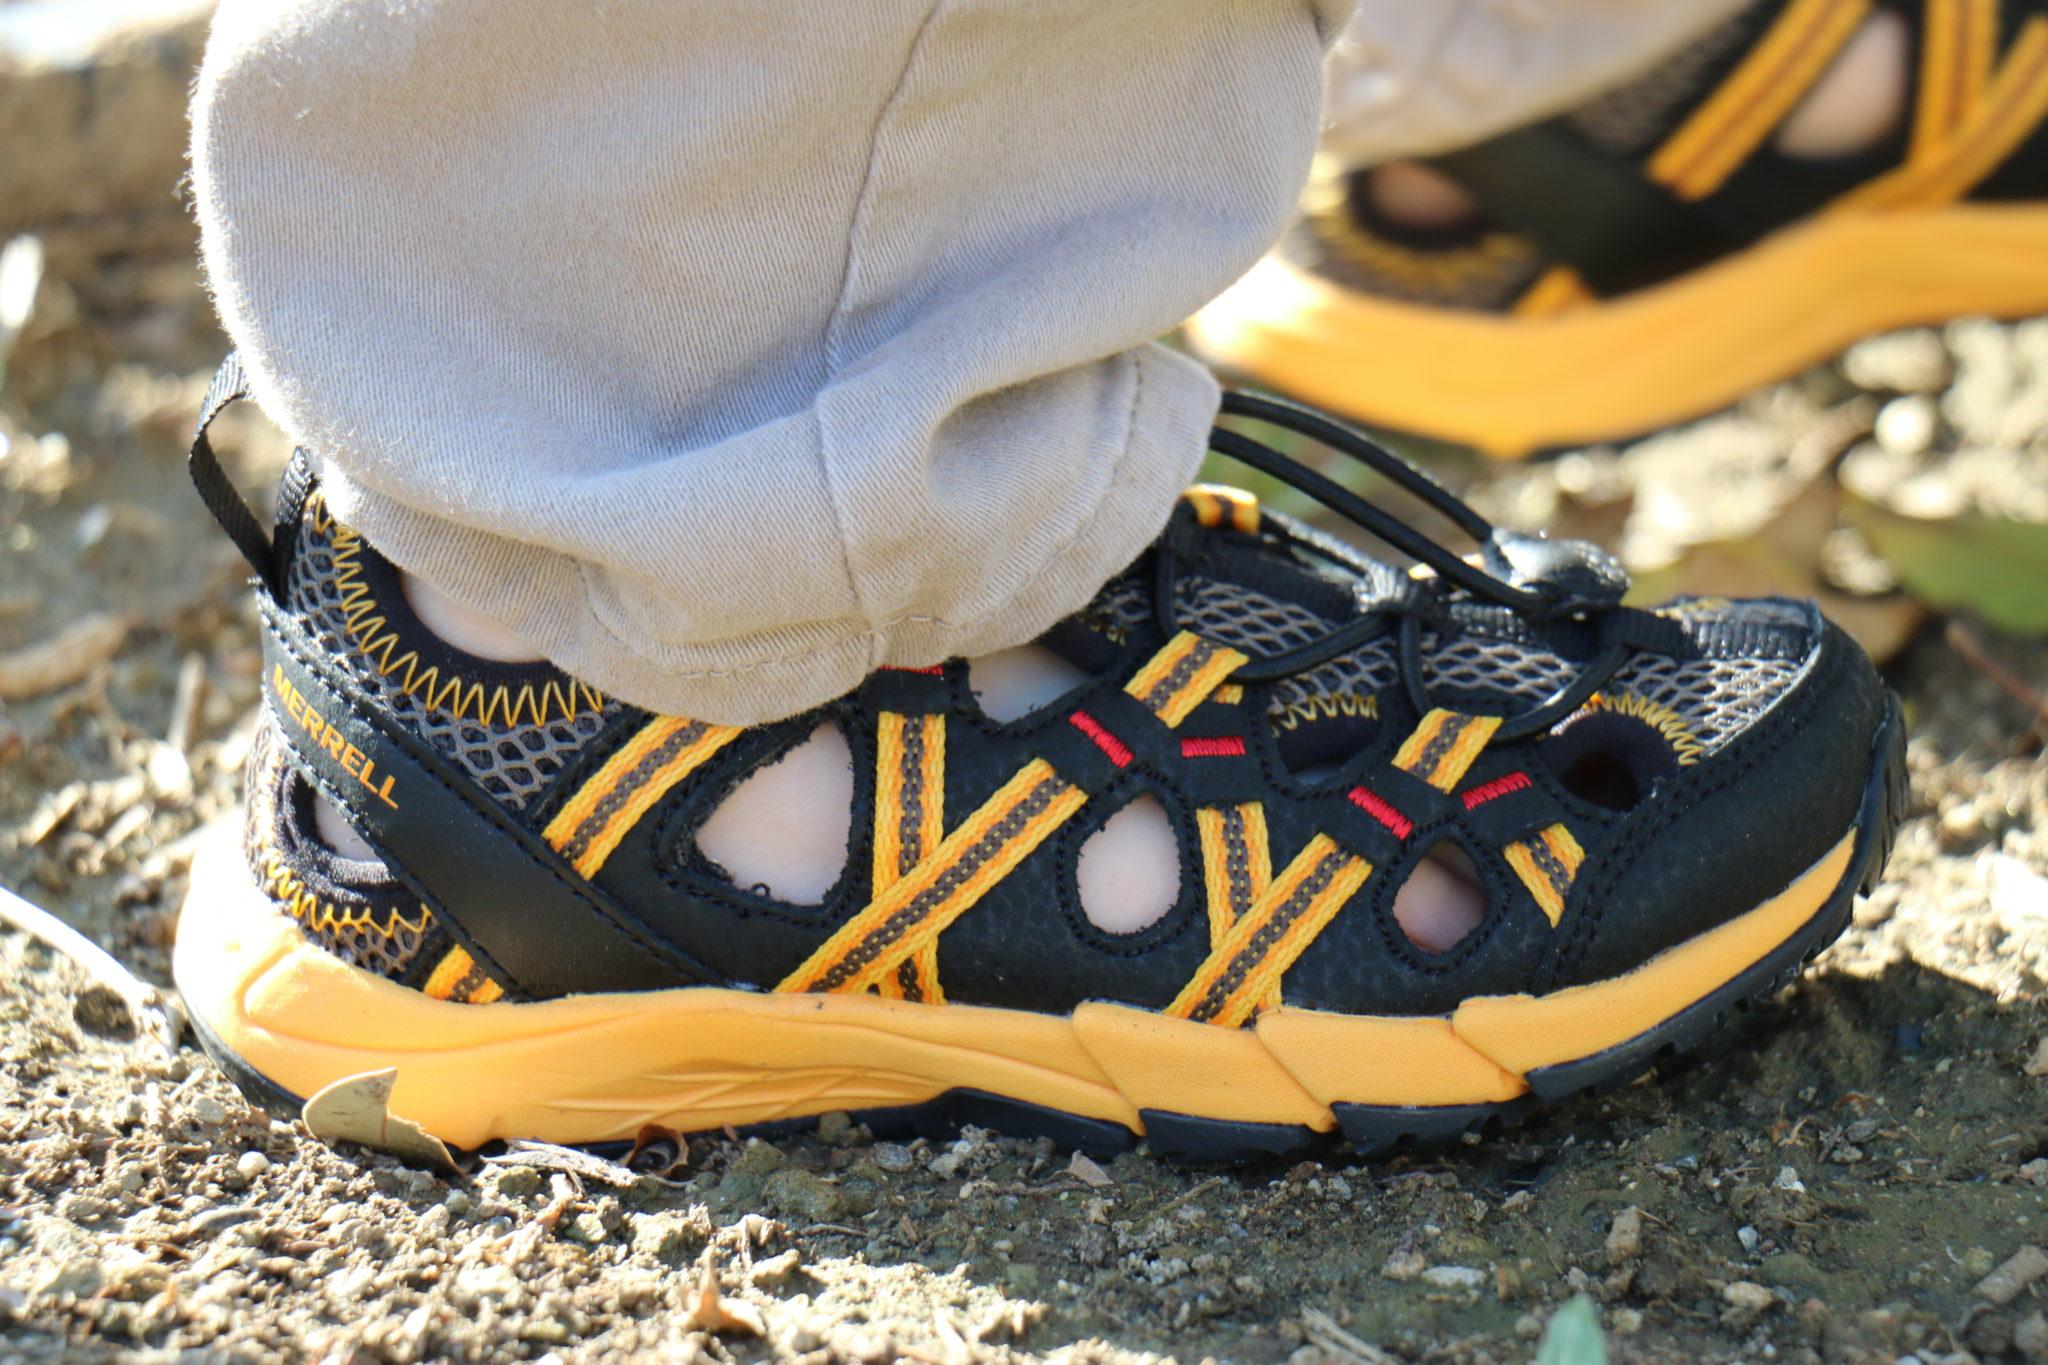 Merrell Hydro Choprock Review - Hiking Lady